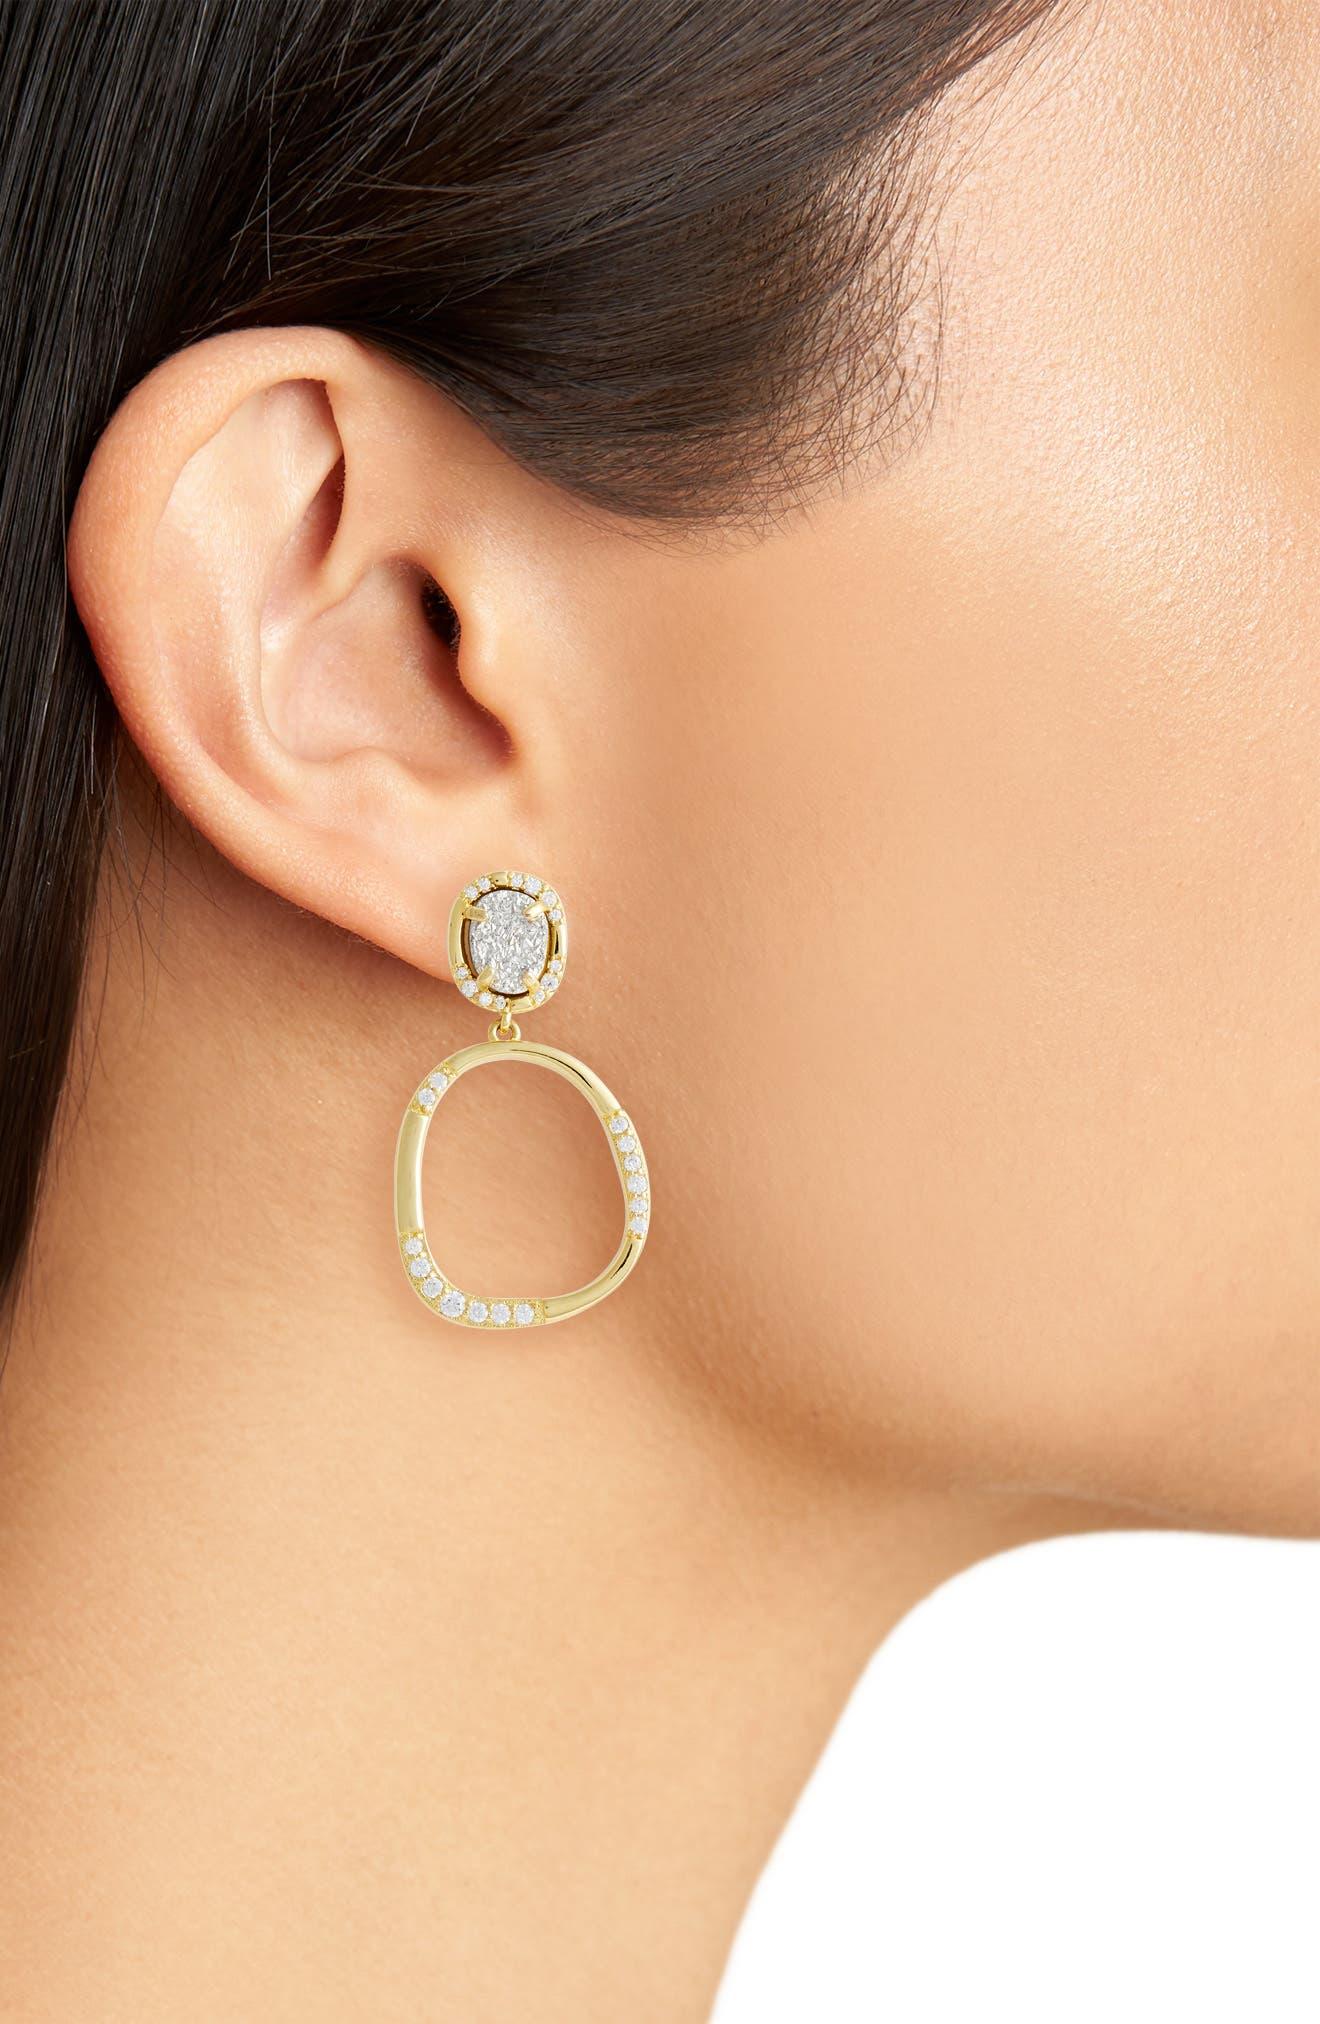 Luna Drop Earrings,                             Alternate thumbnail 2, color,                             710